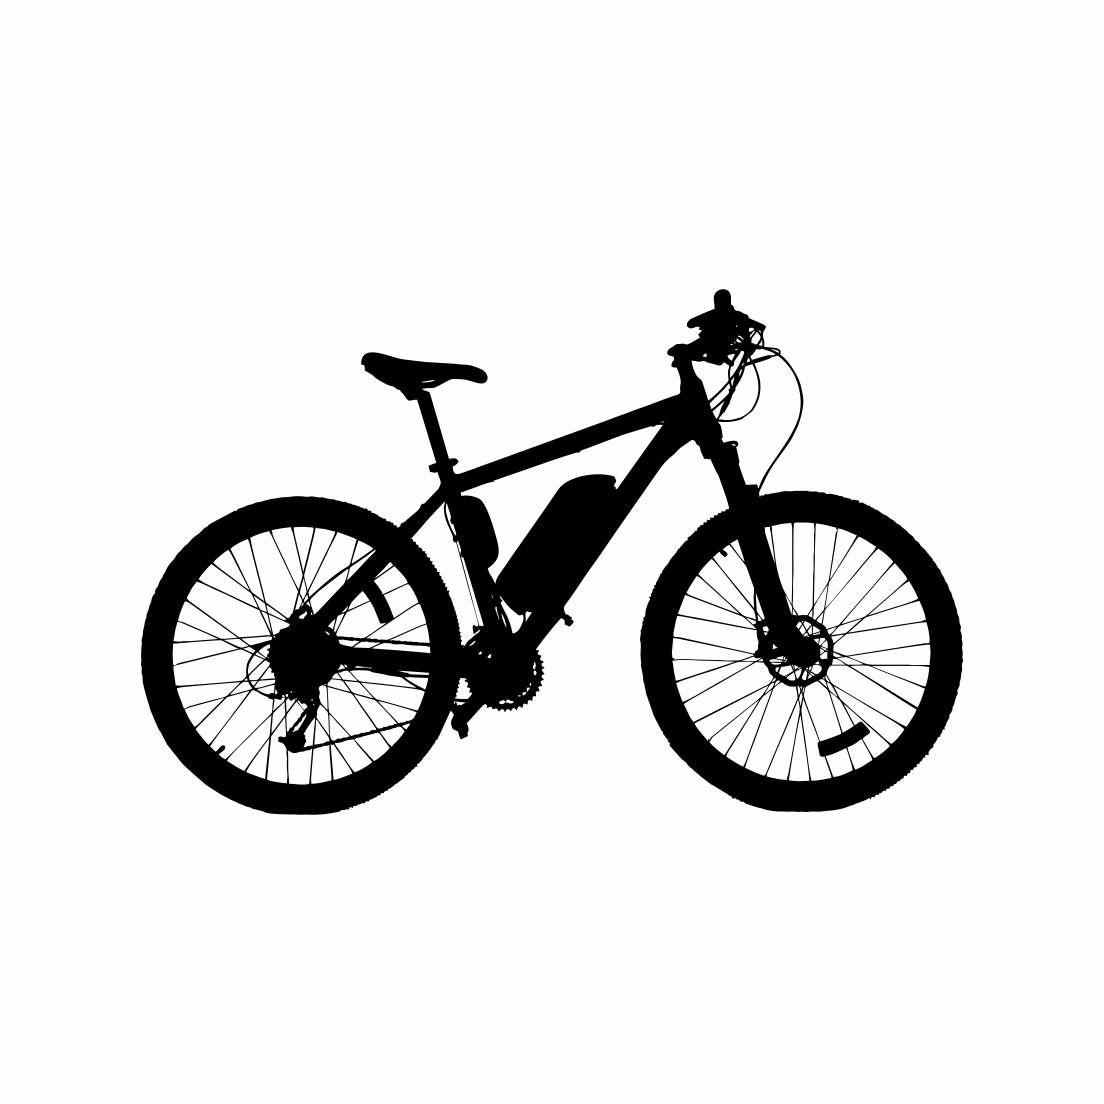 Bicicleta vector clipart transparent Pin szerzője: Sülle Katalin, közzétéve itt: Silhouette transparent